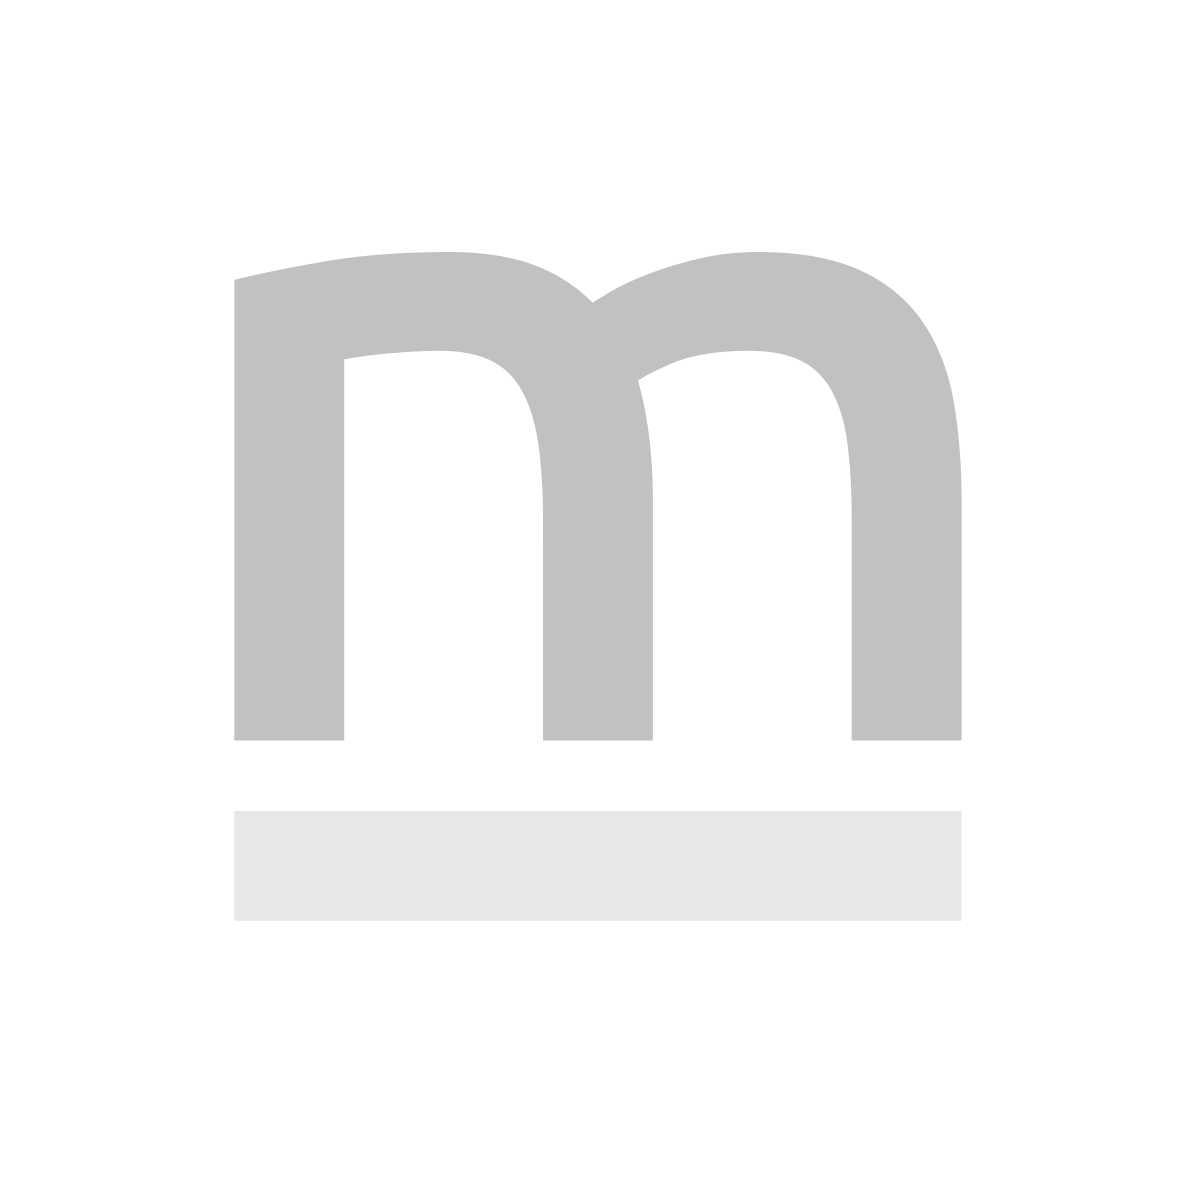 Krzesło NAPO VELVET szare